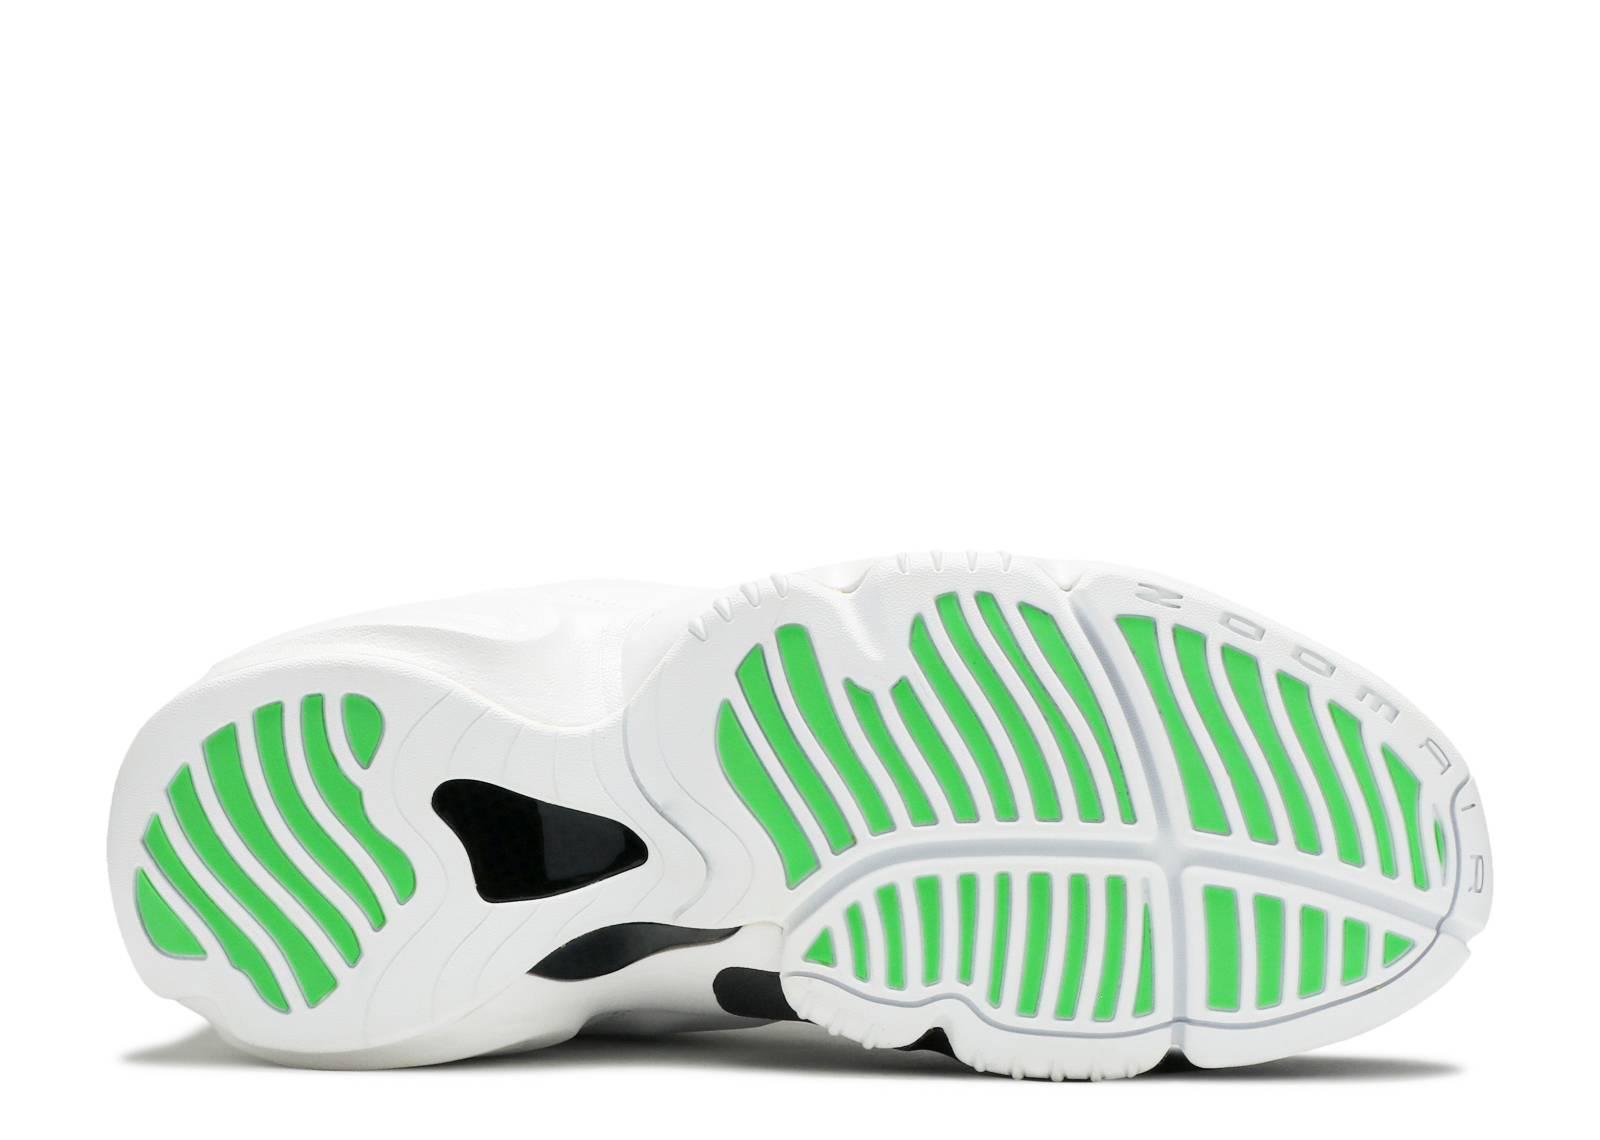 Air Zoom Flight The Glove Sl - Nike - 616773 100 - white/black-poison green  | Flight Club